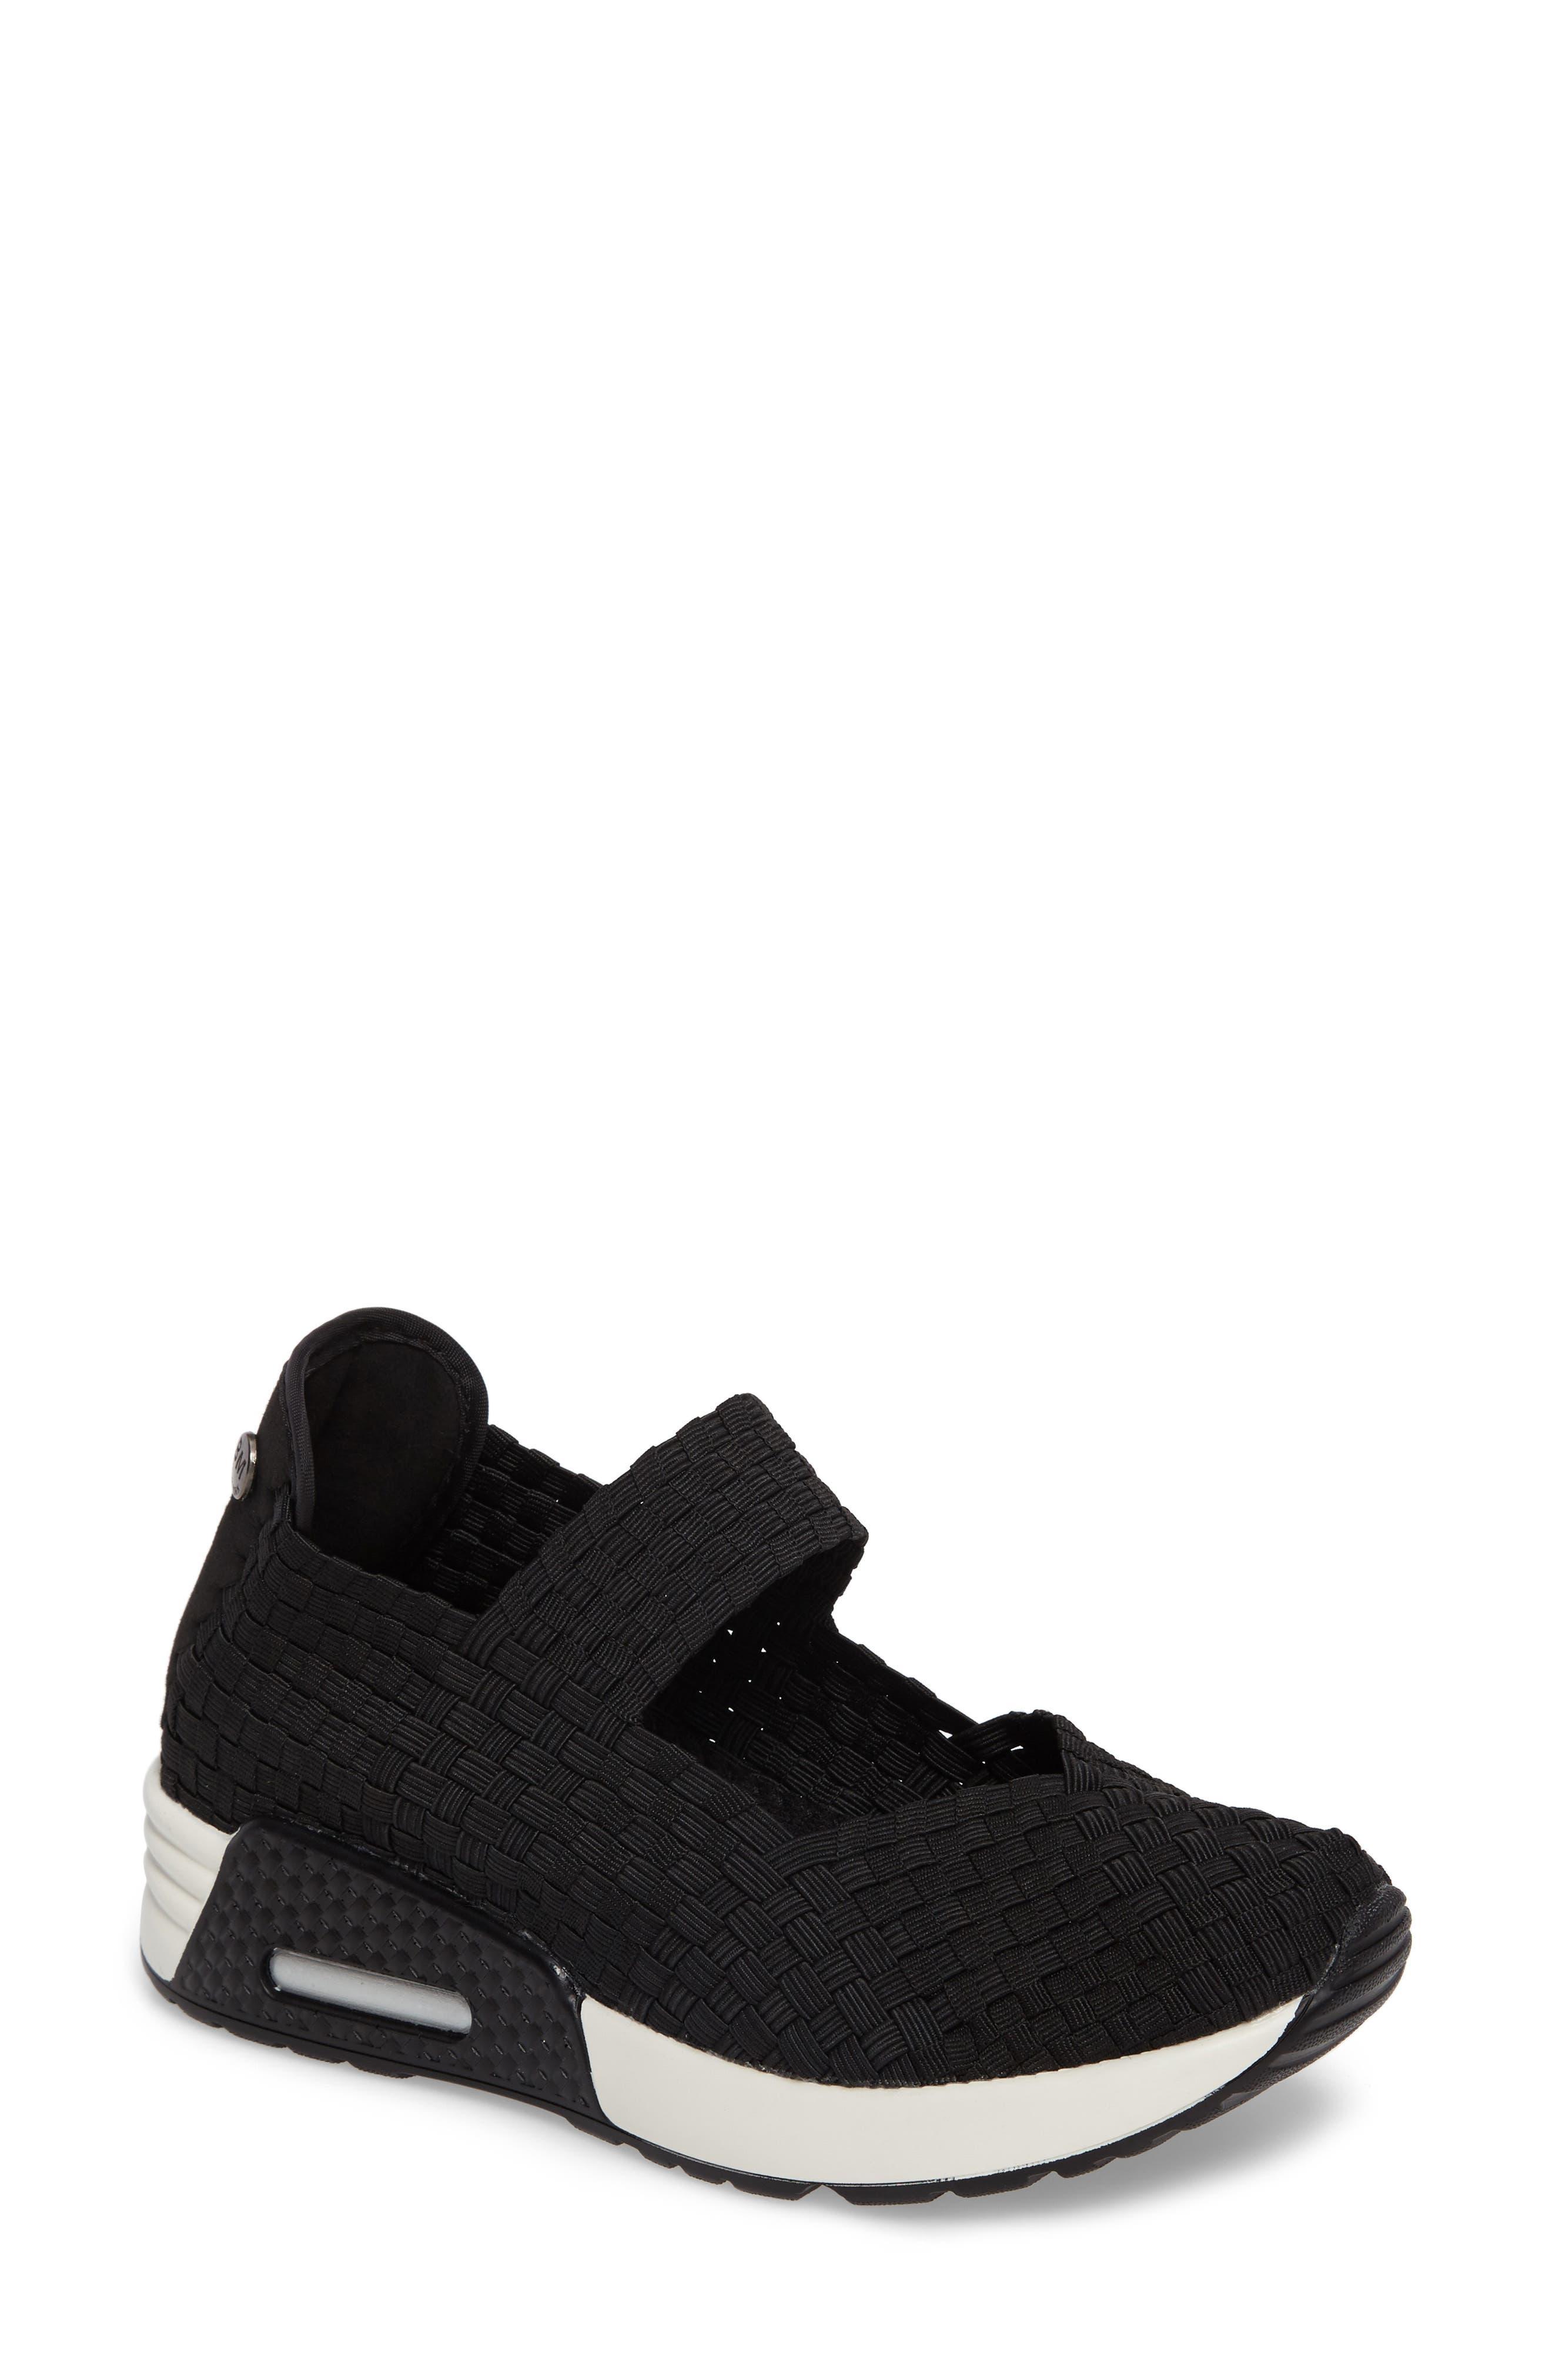 Bernie Mev. Best Charm Mary Jane Sneaker, Black